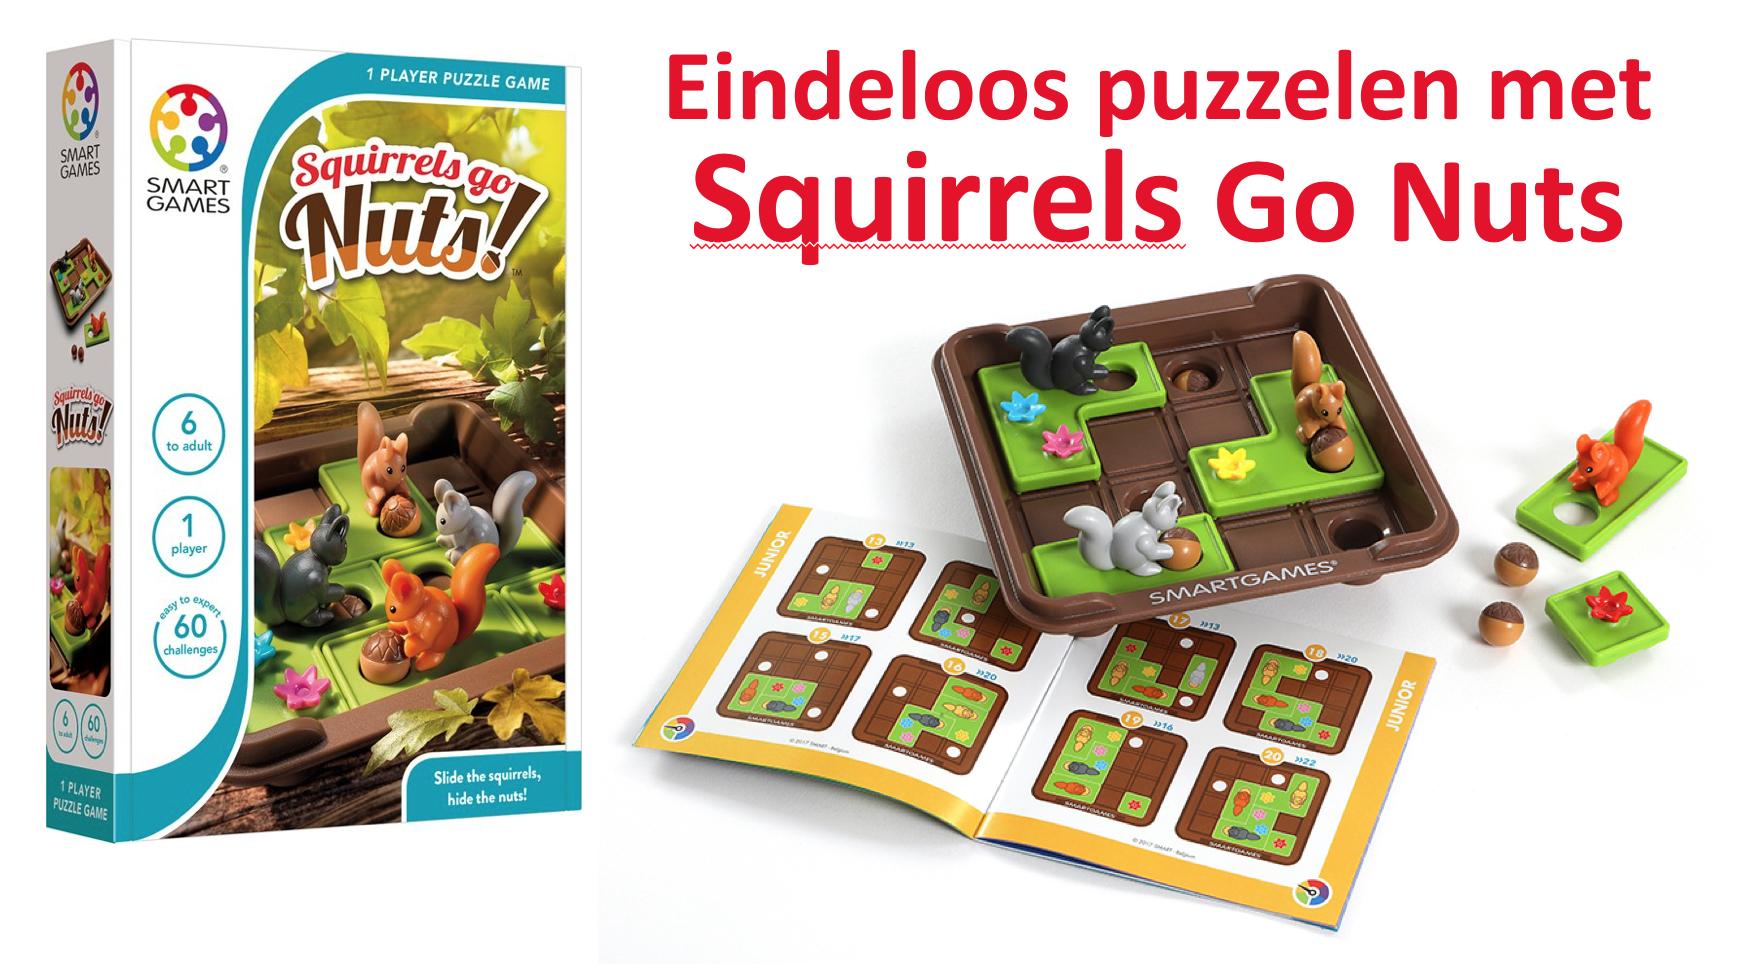 Eindeloos puzzelen met Squirrels Go Nuts